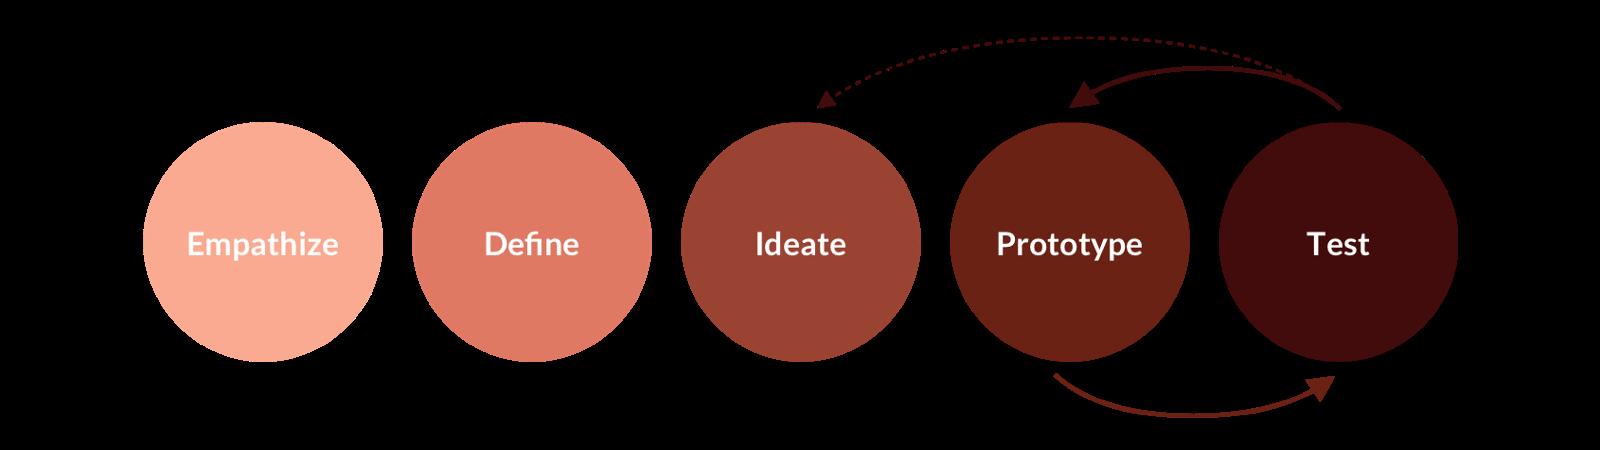 Human Centered Design Process.png